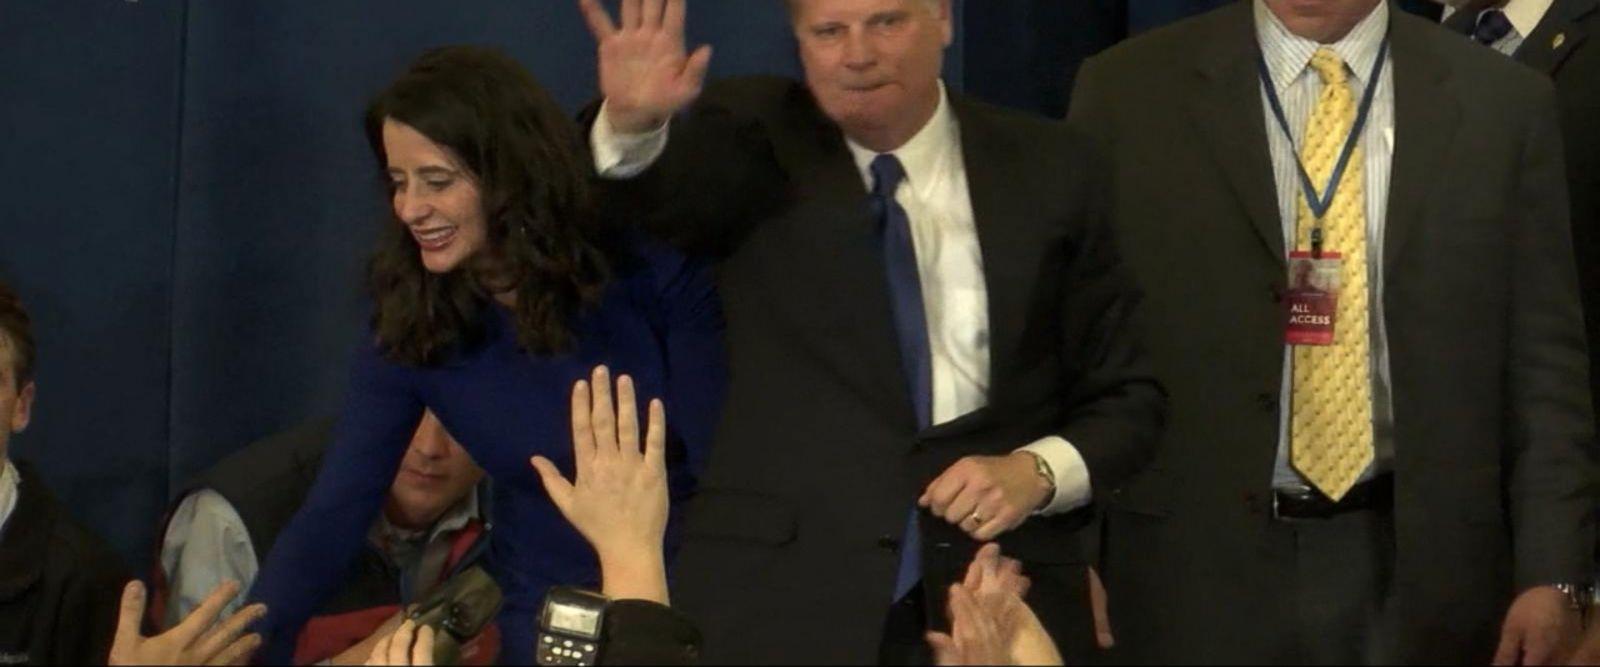 VIDEO: Trump responds after Doug Jones wins Alabama Senate race